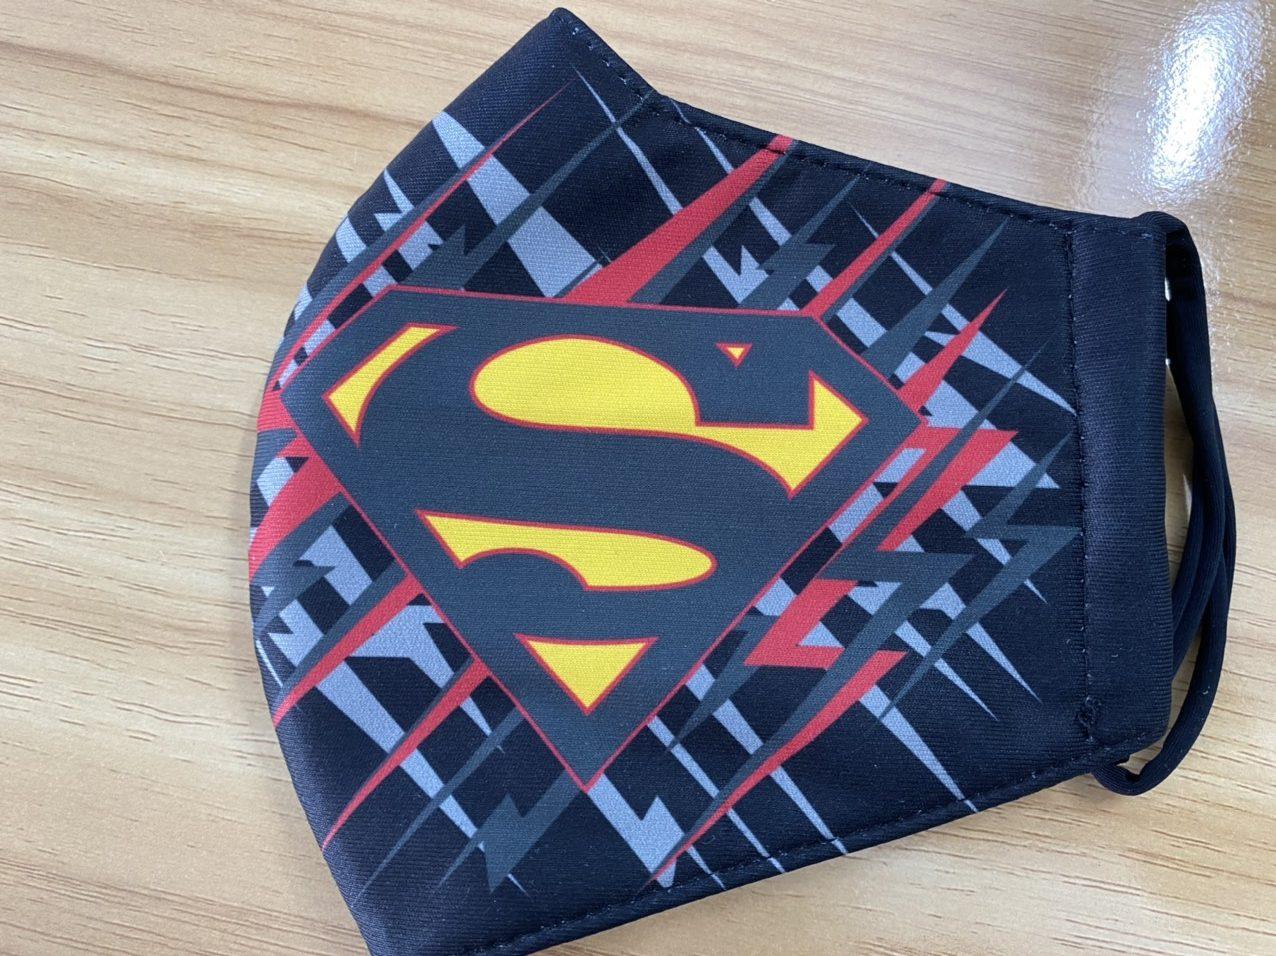 Khẩu Trang Vải In Logo SuperMan 2 Lớp - Mẫu Khẩu Trang In 3D Logo Super Man Nền Xanh 6